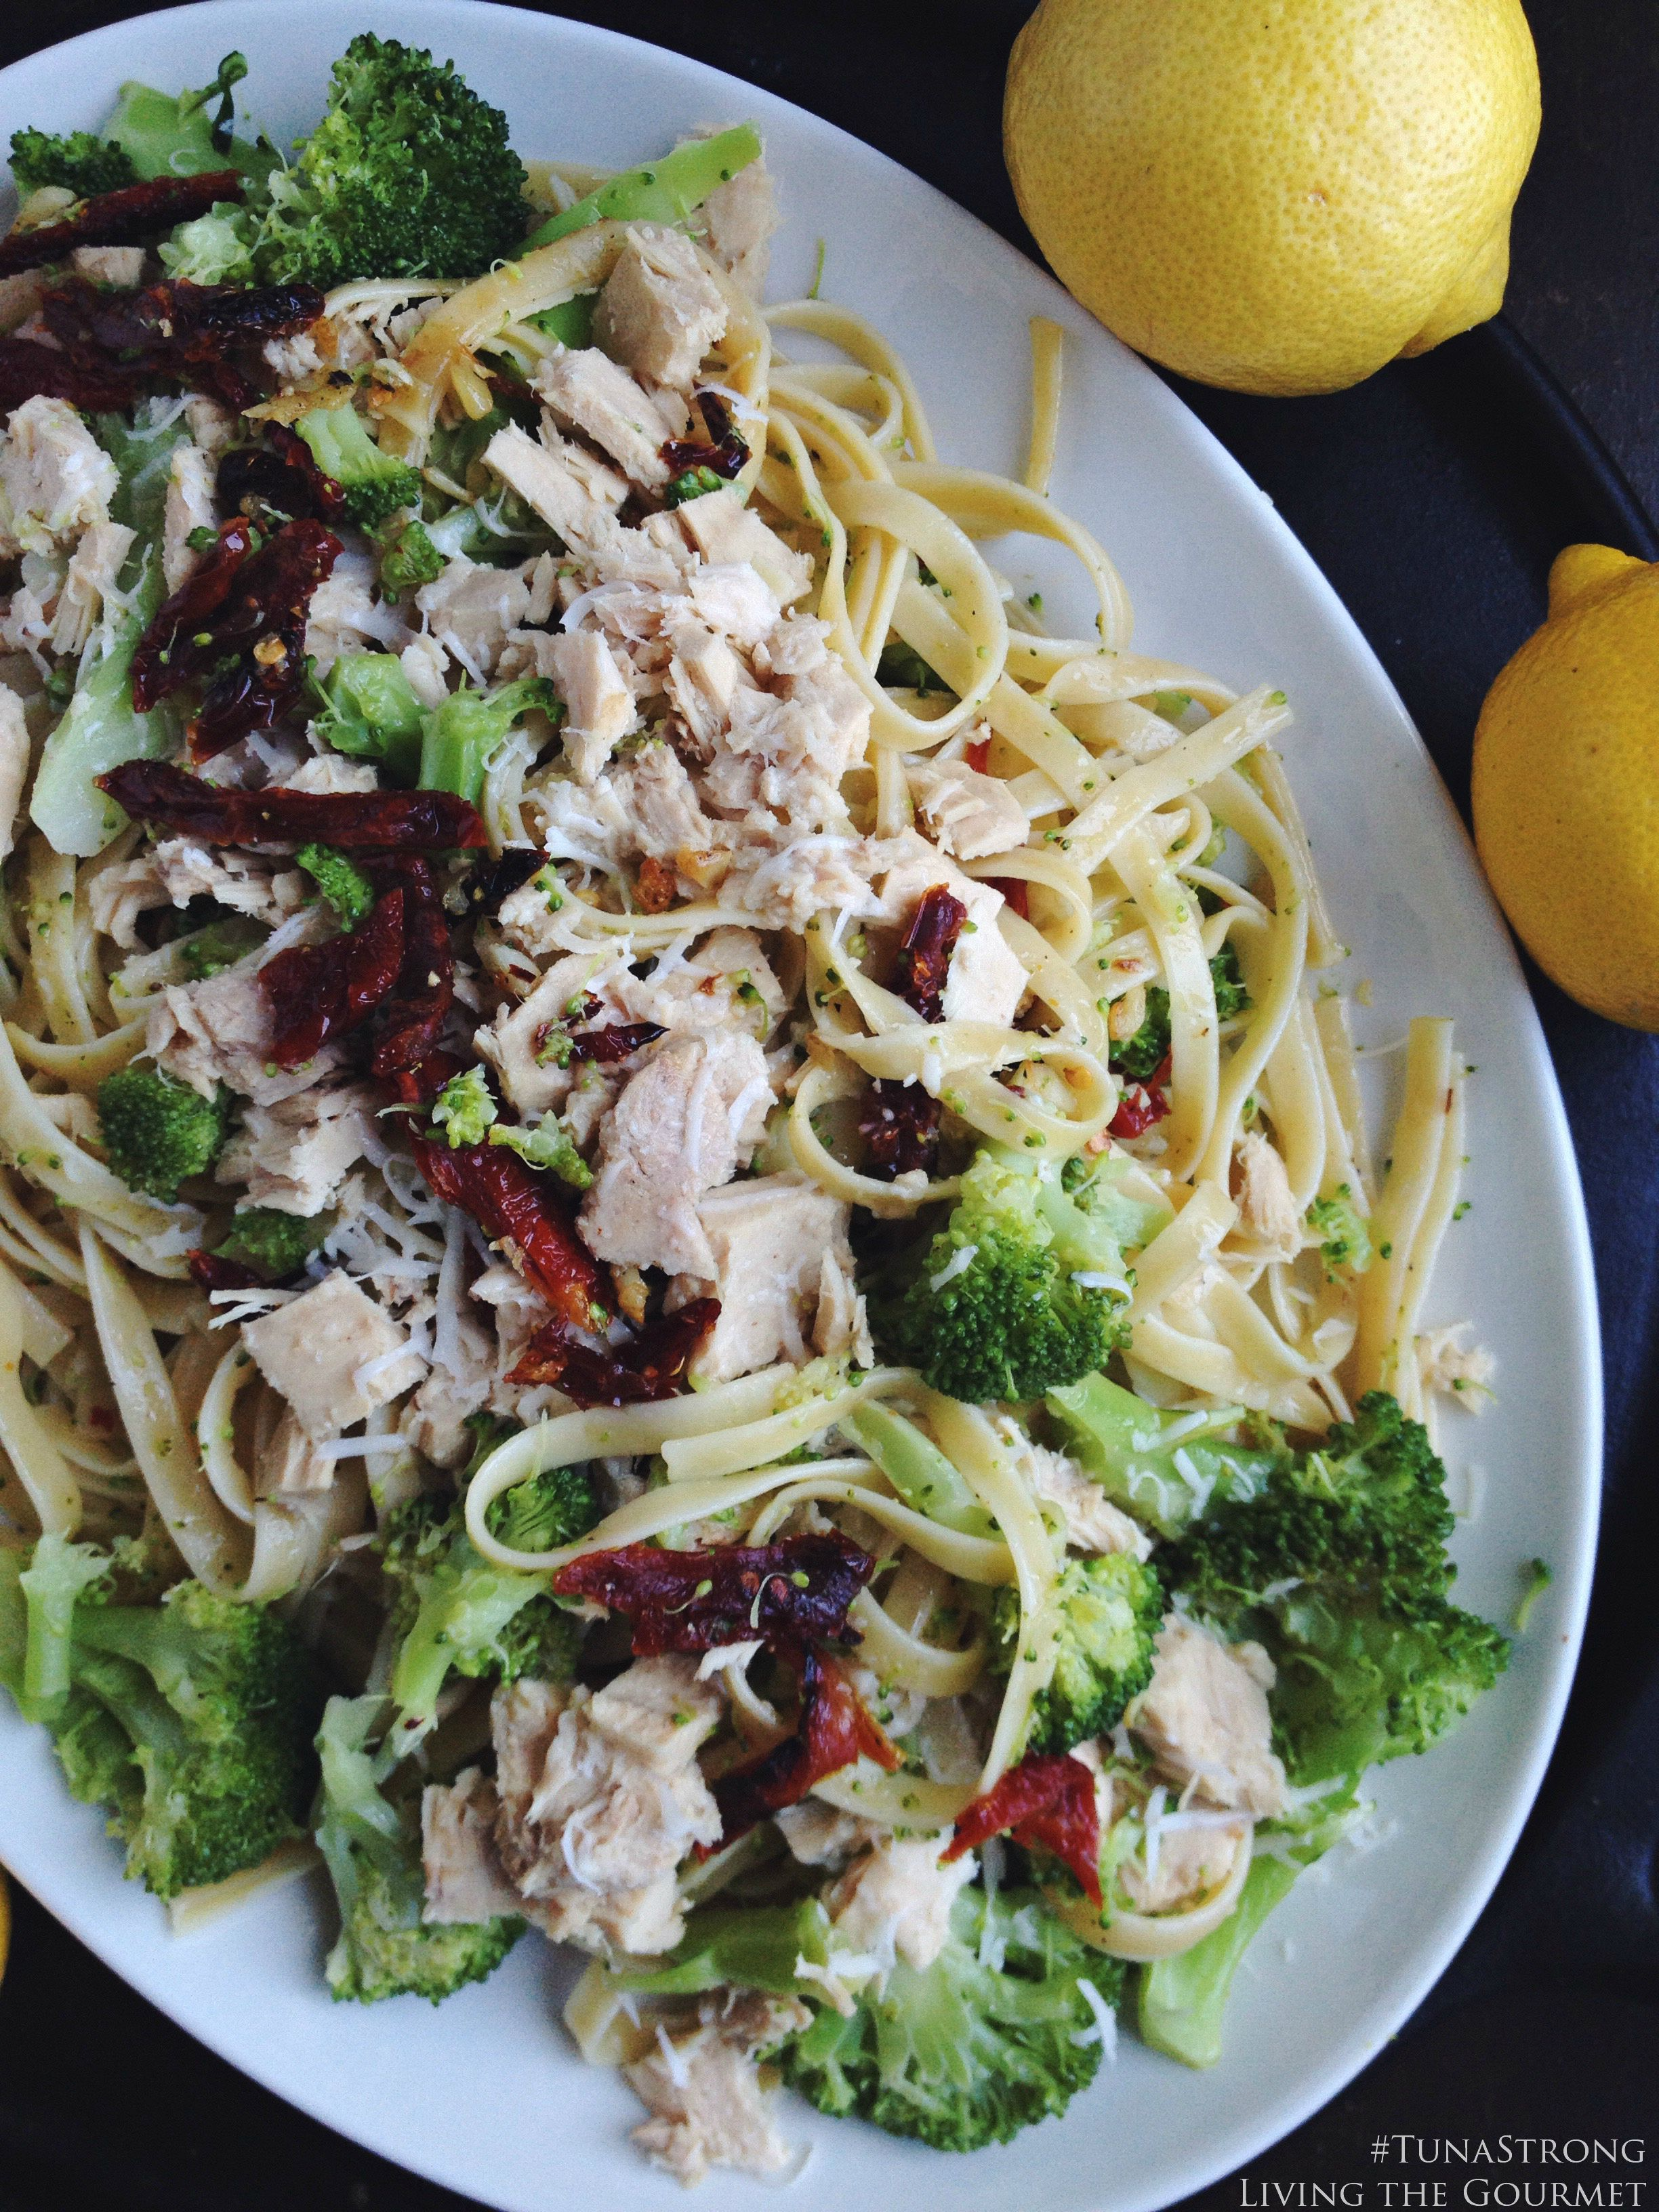 Living the Gourmet: Broccoli and Tuna Fettuccine | #TunaStrong #CG